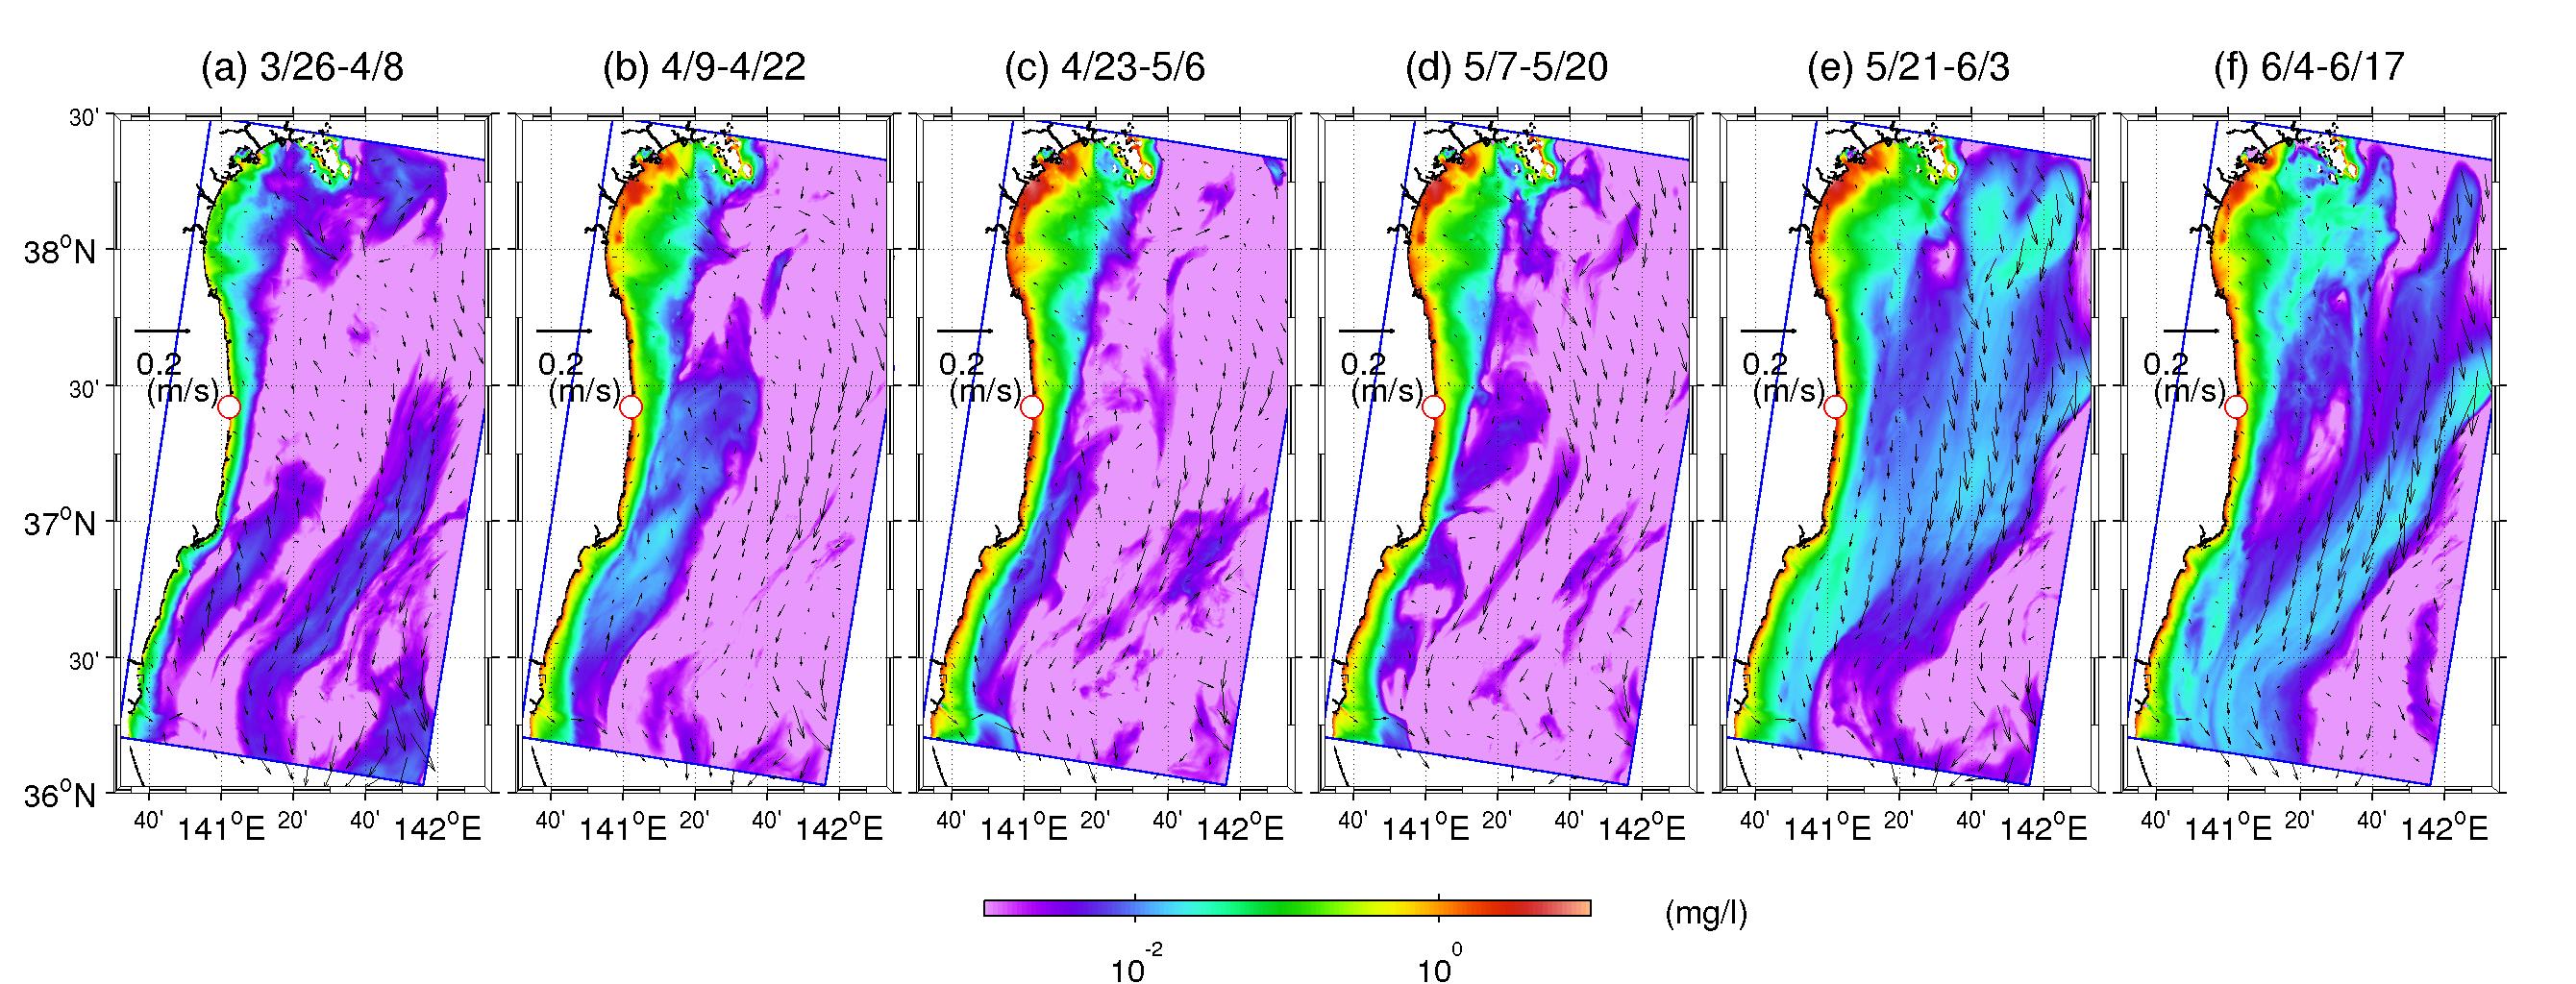 Fukushima Dispersal